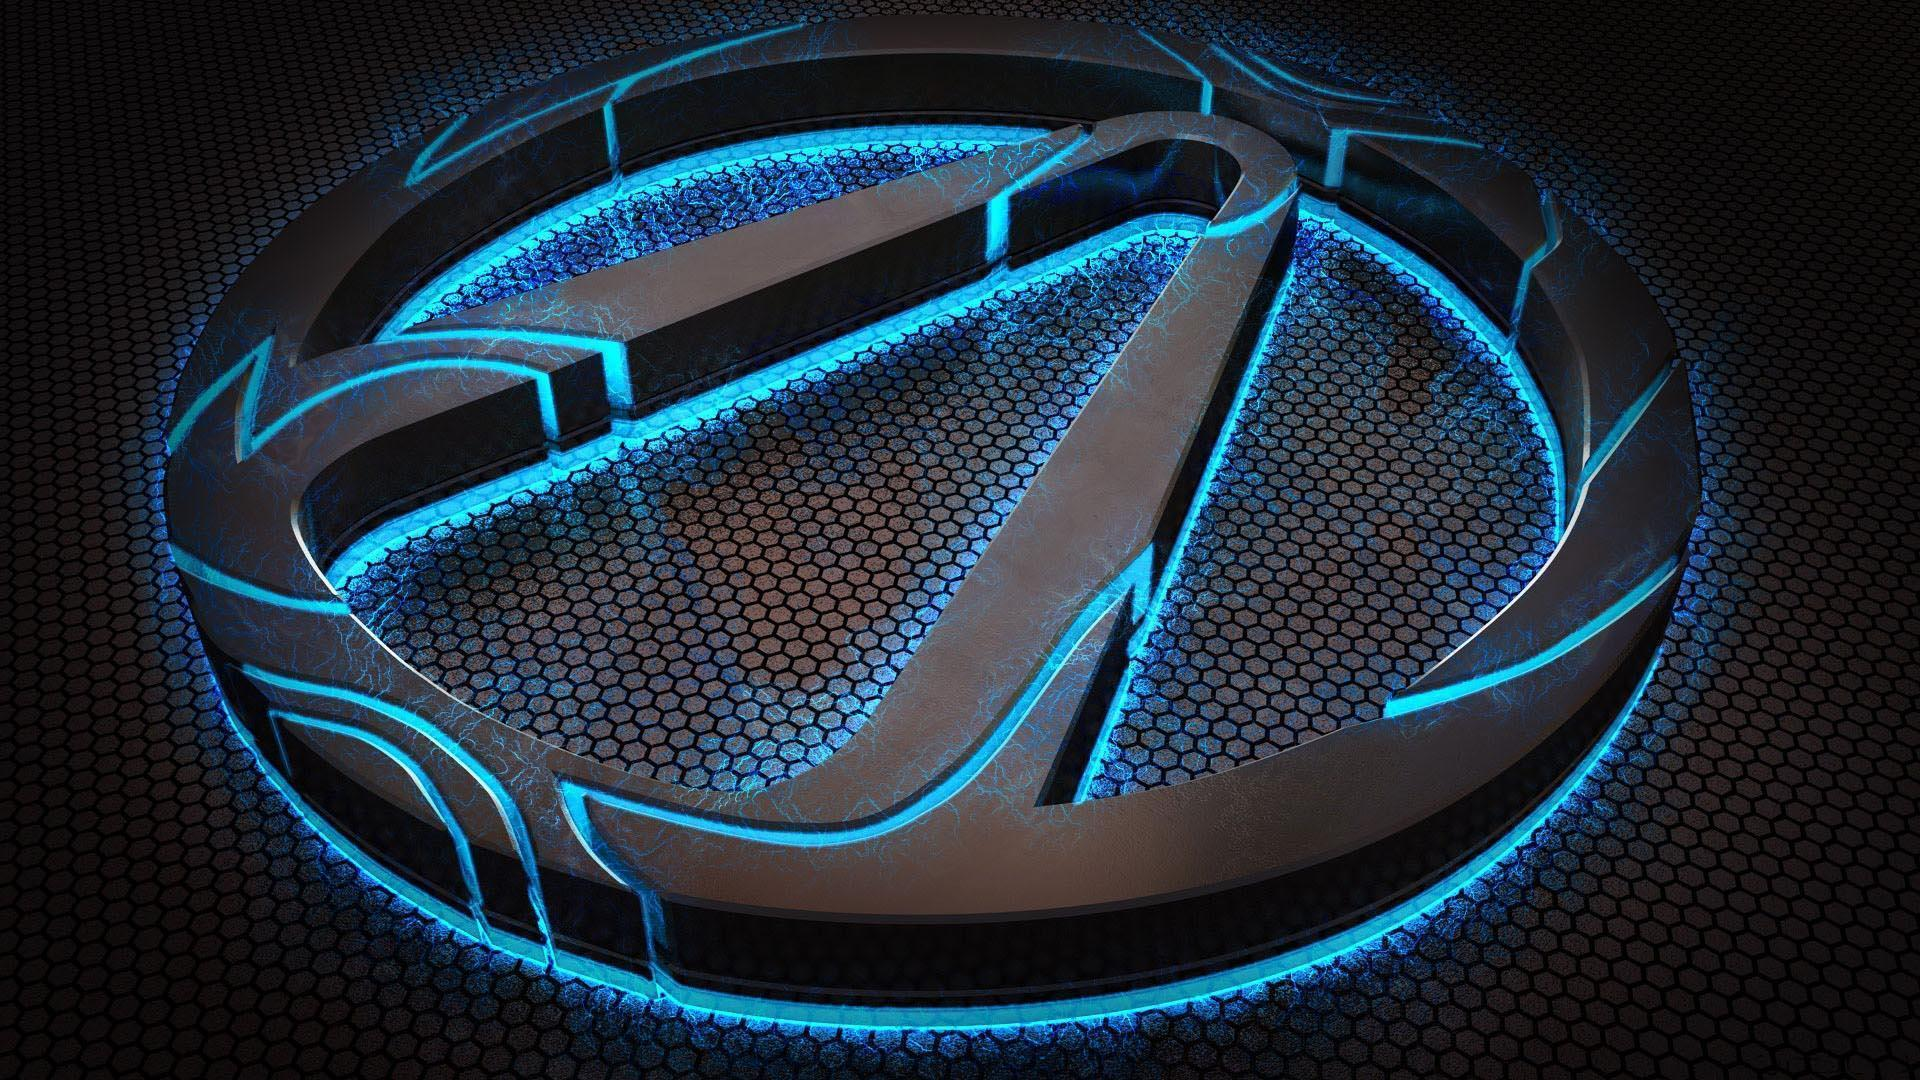 PAMEPERIPATO: Cool Logo Backgrounds.